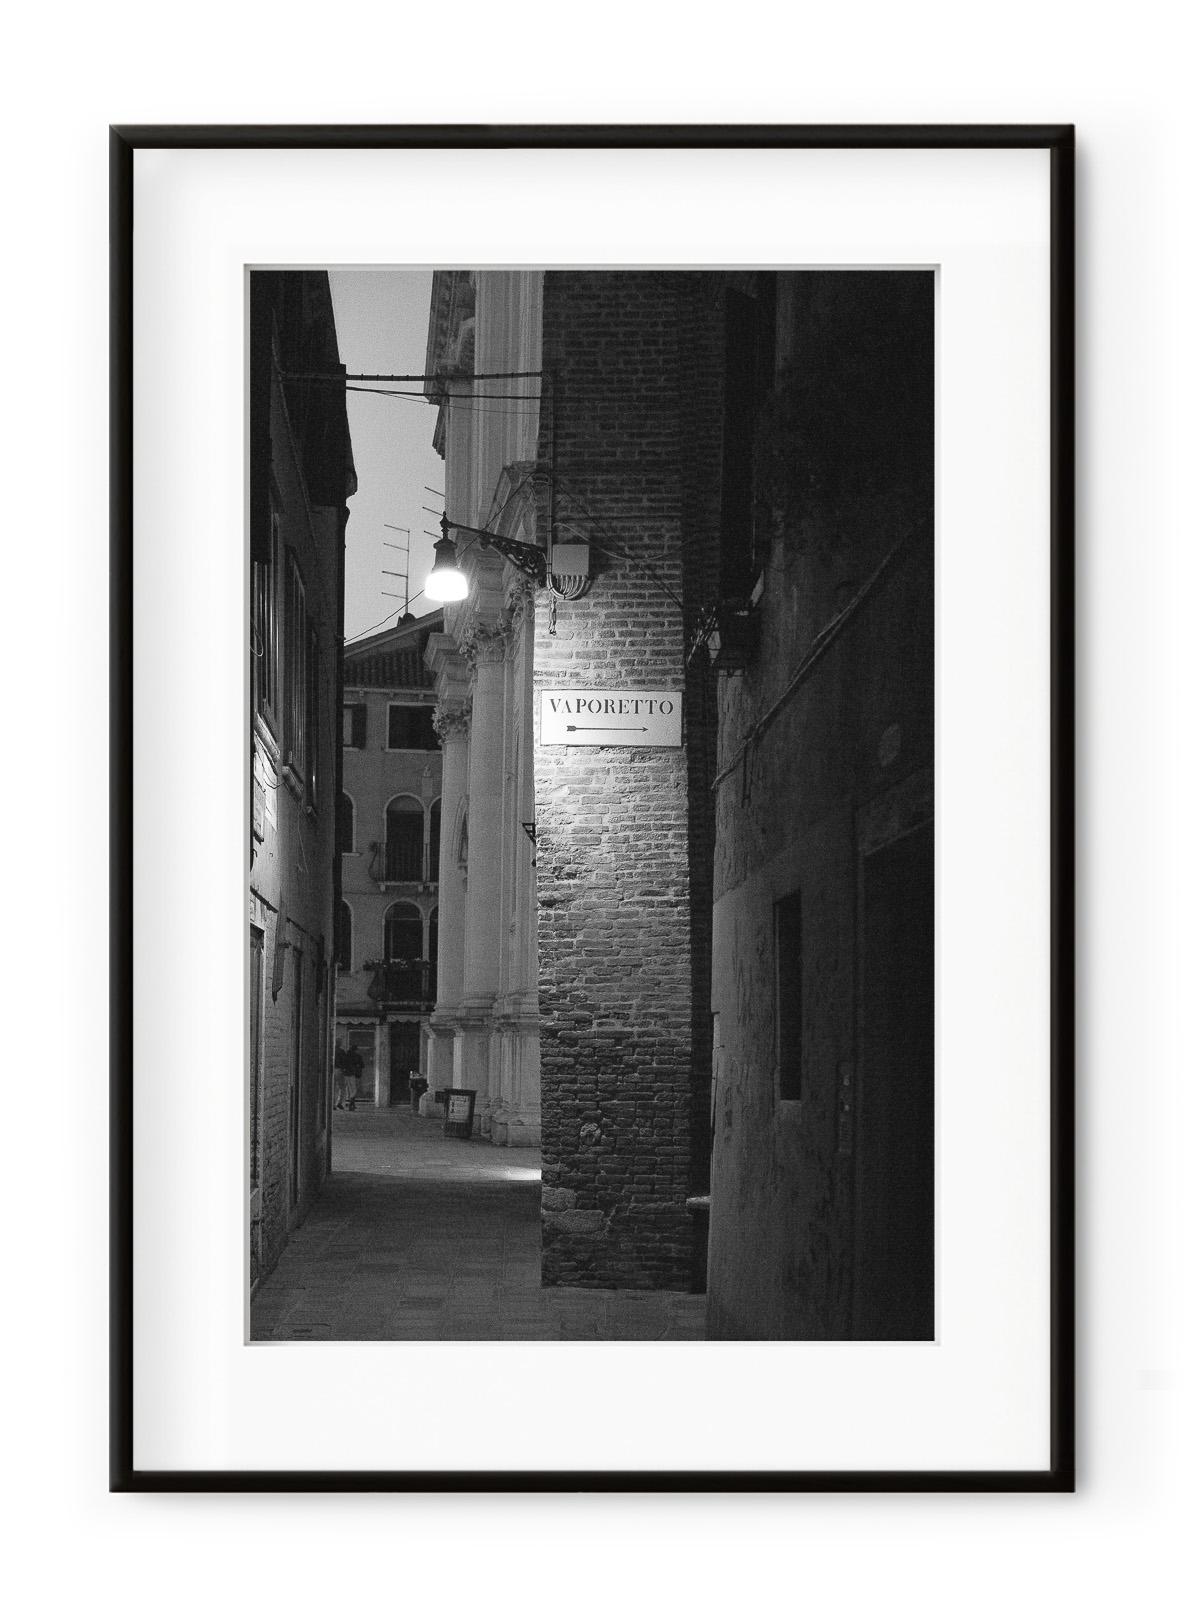 Tablou Venezia di Notte Vaporetto Aluminium Noir